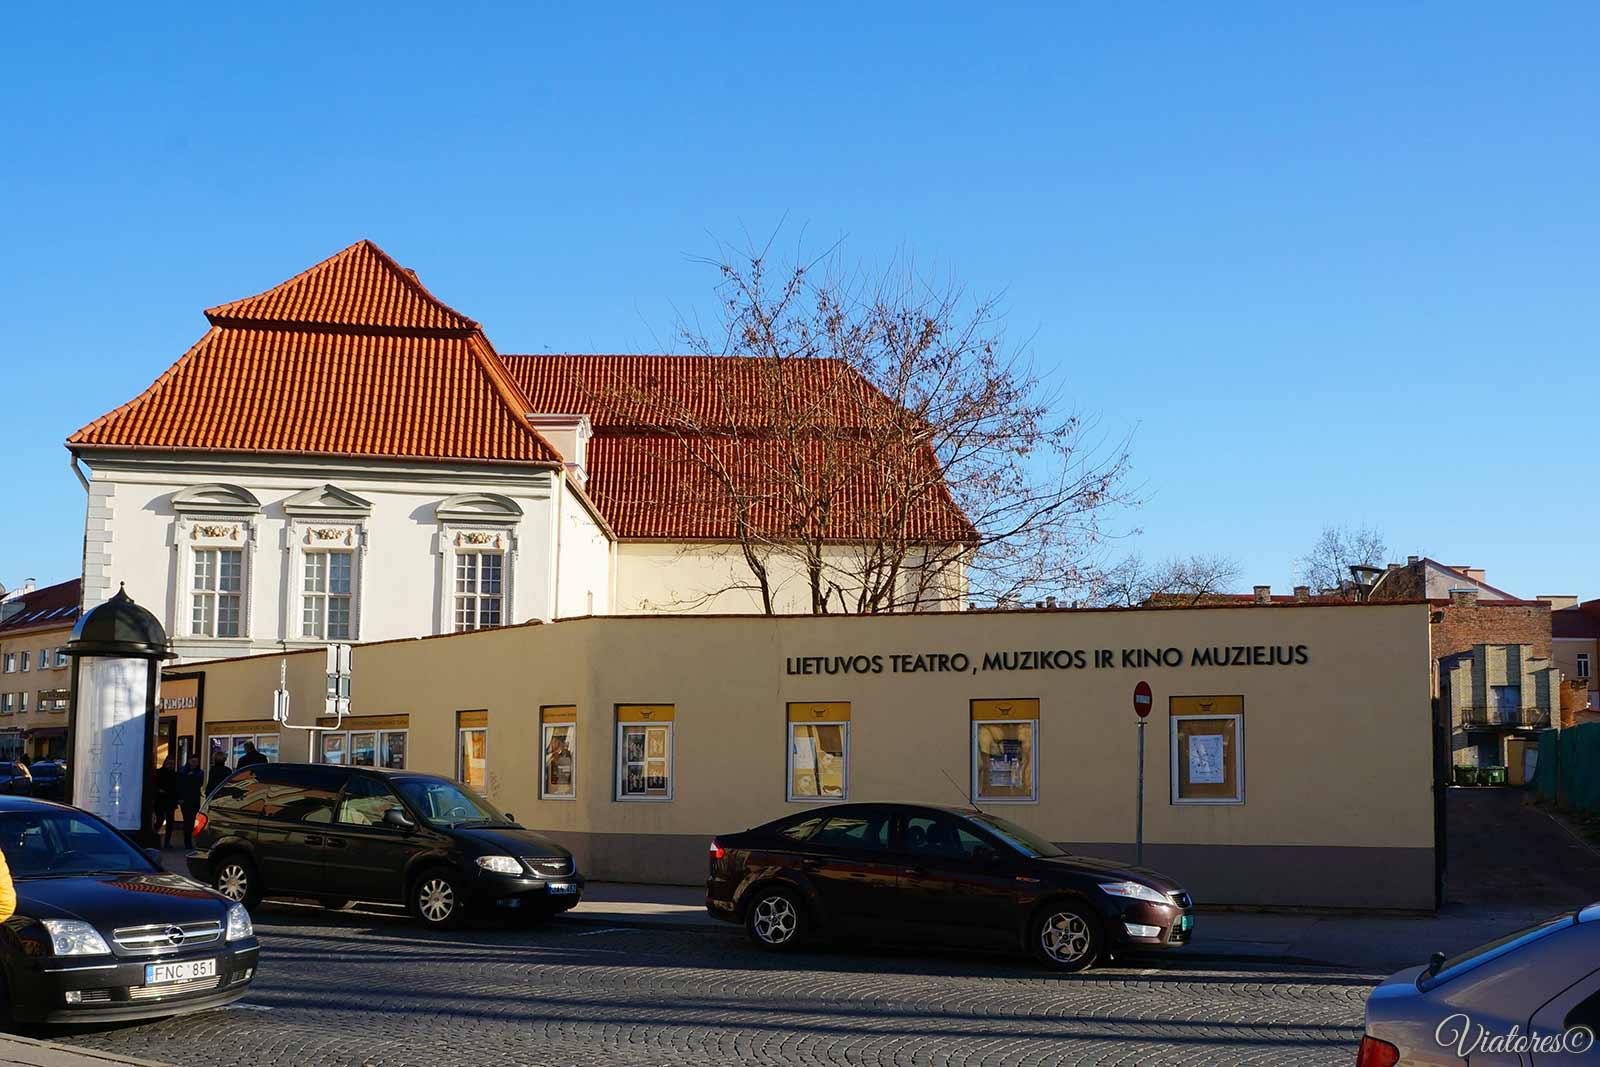 Музей Литовского театра, музыки и кино (Lietuvos-teatro,-muzikos-ir-kino-muziejus)